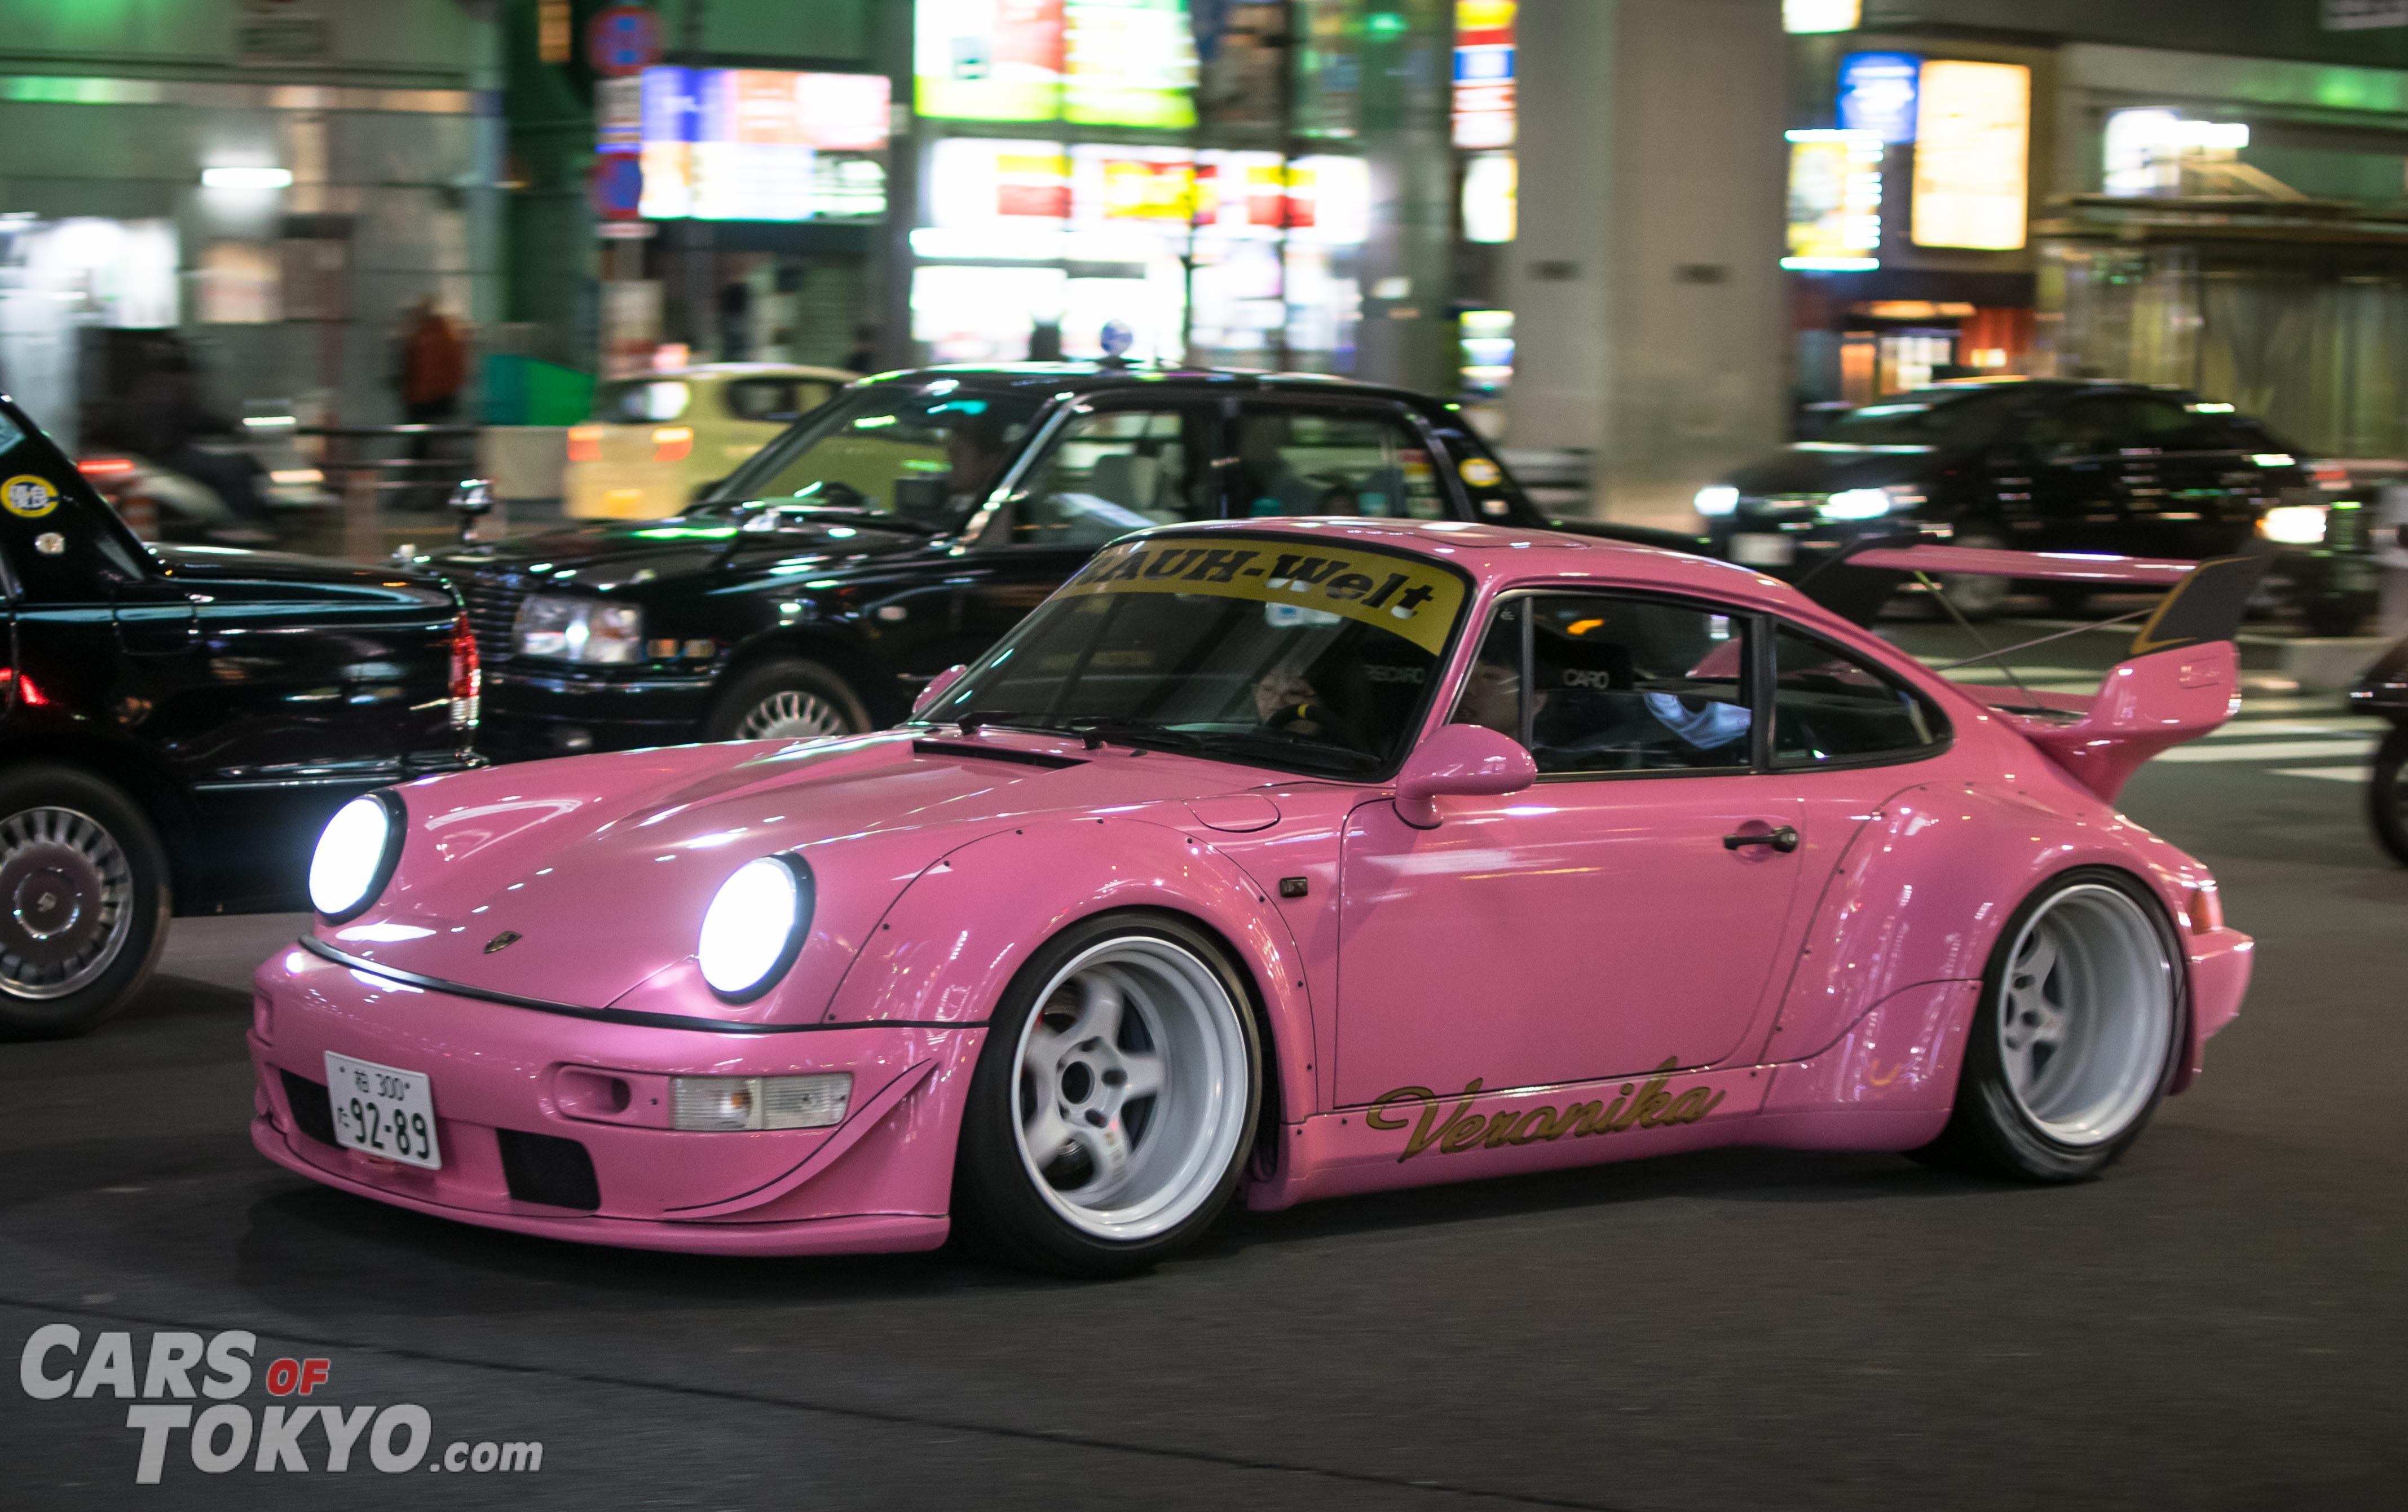 Cars of Tokyo RWB Porsche 911 Veronica